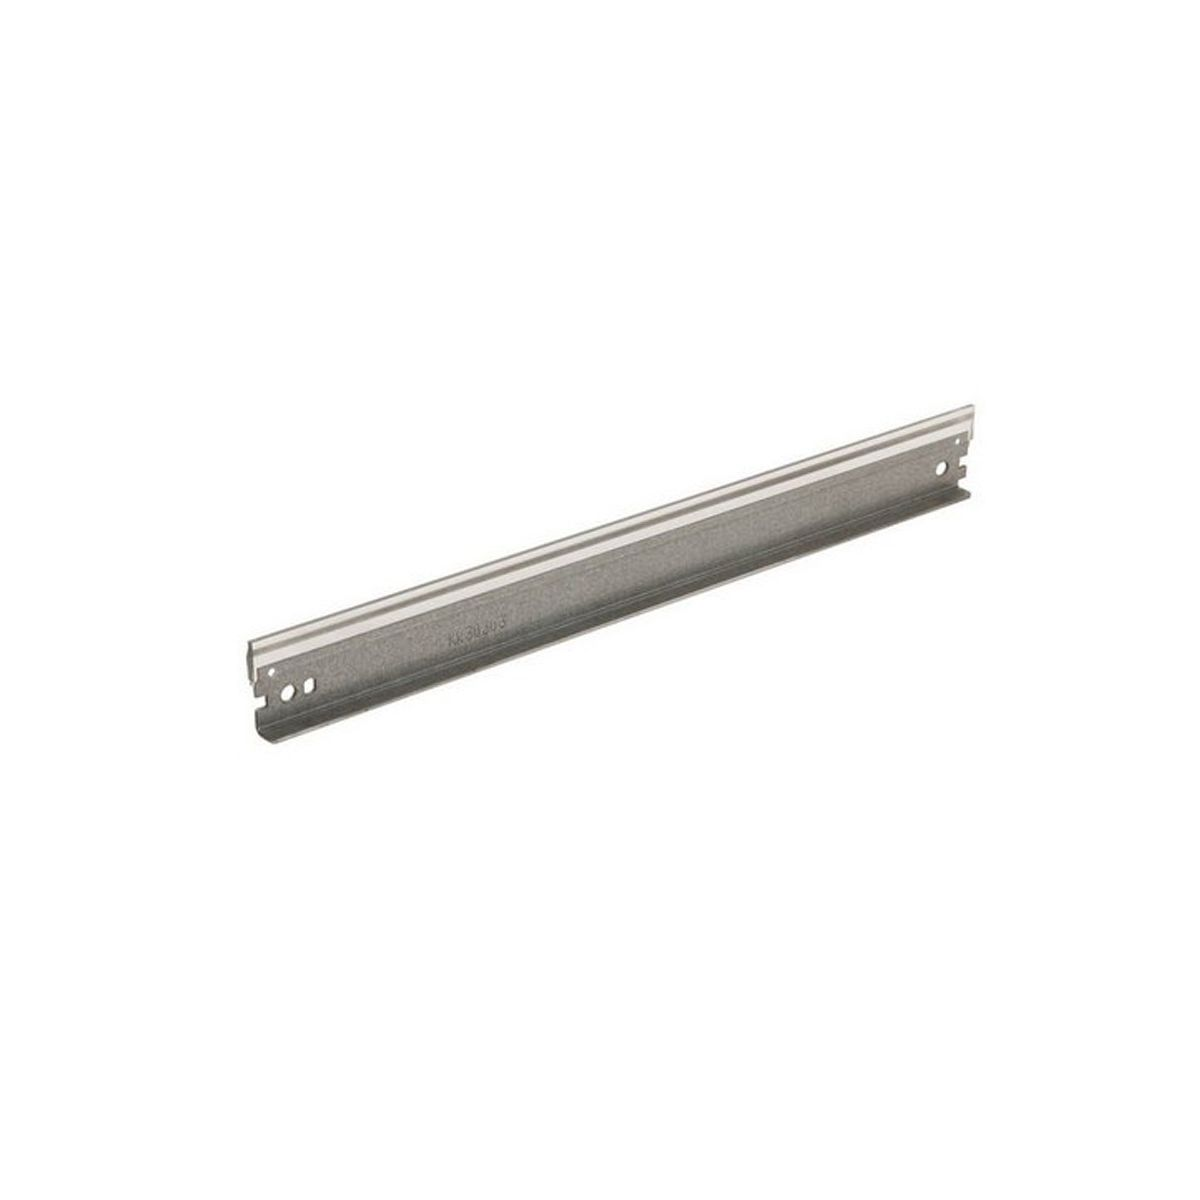 Lamina Limpeza Wiper Blade HP CB436 436a 436 - M1120 P1505 M1522